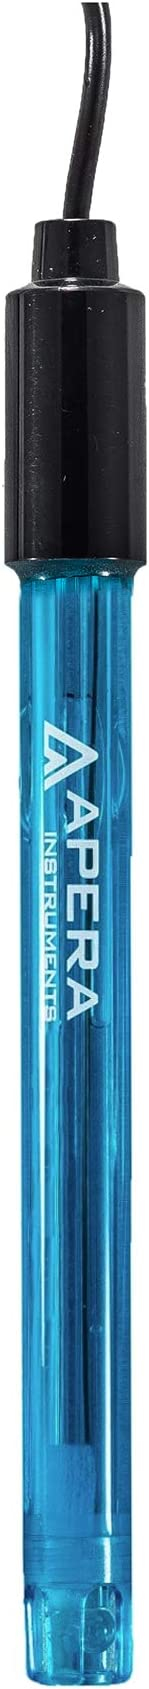 Apera Instruments 201-C Combination pH Electrode